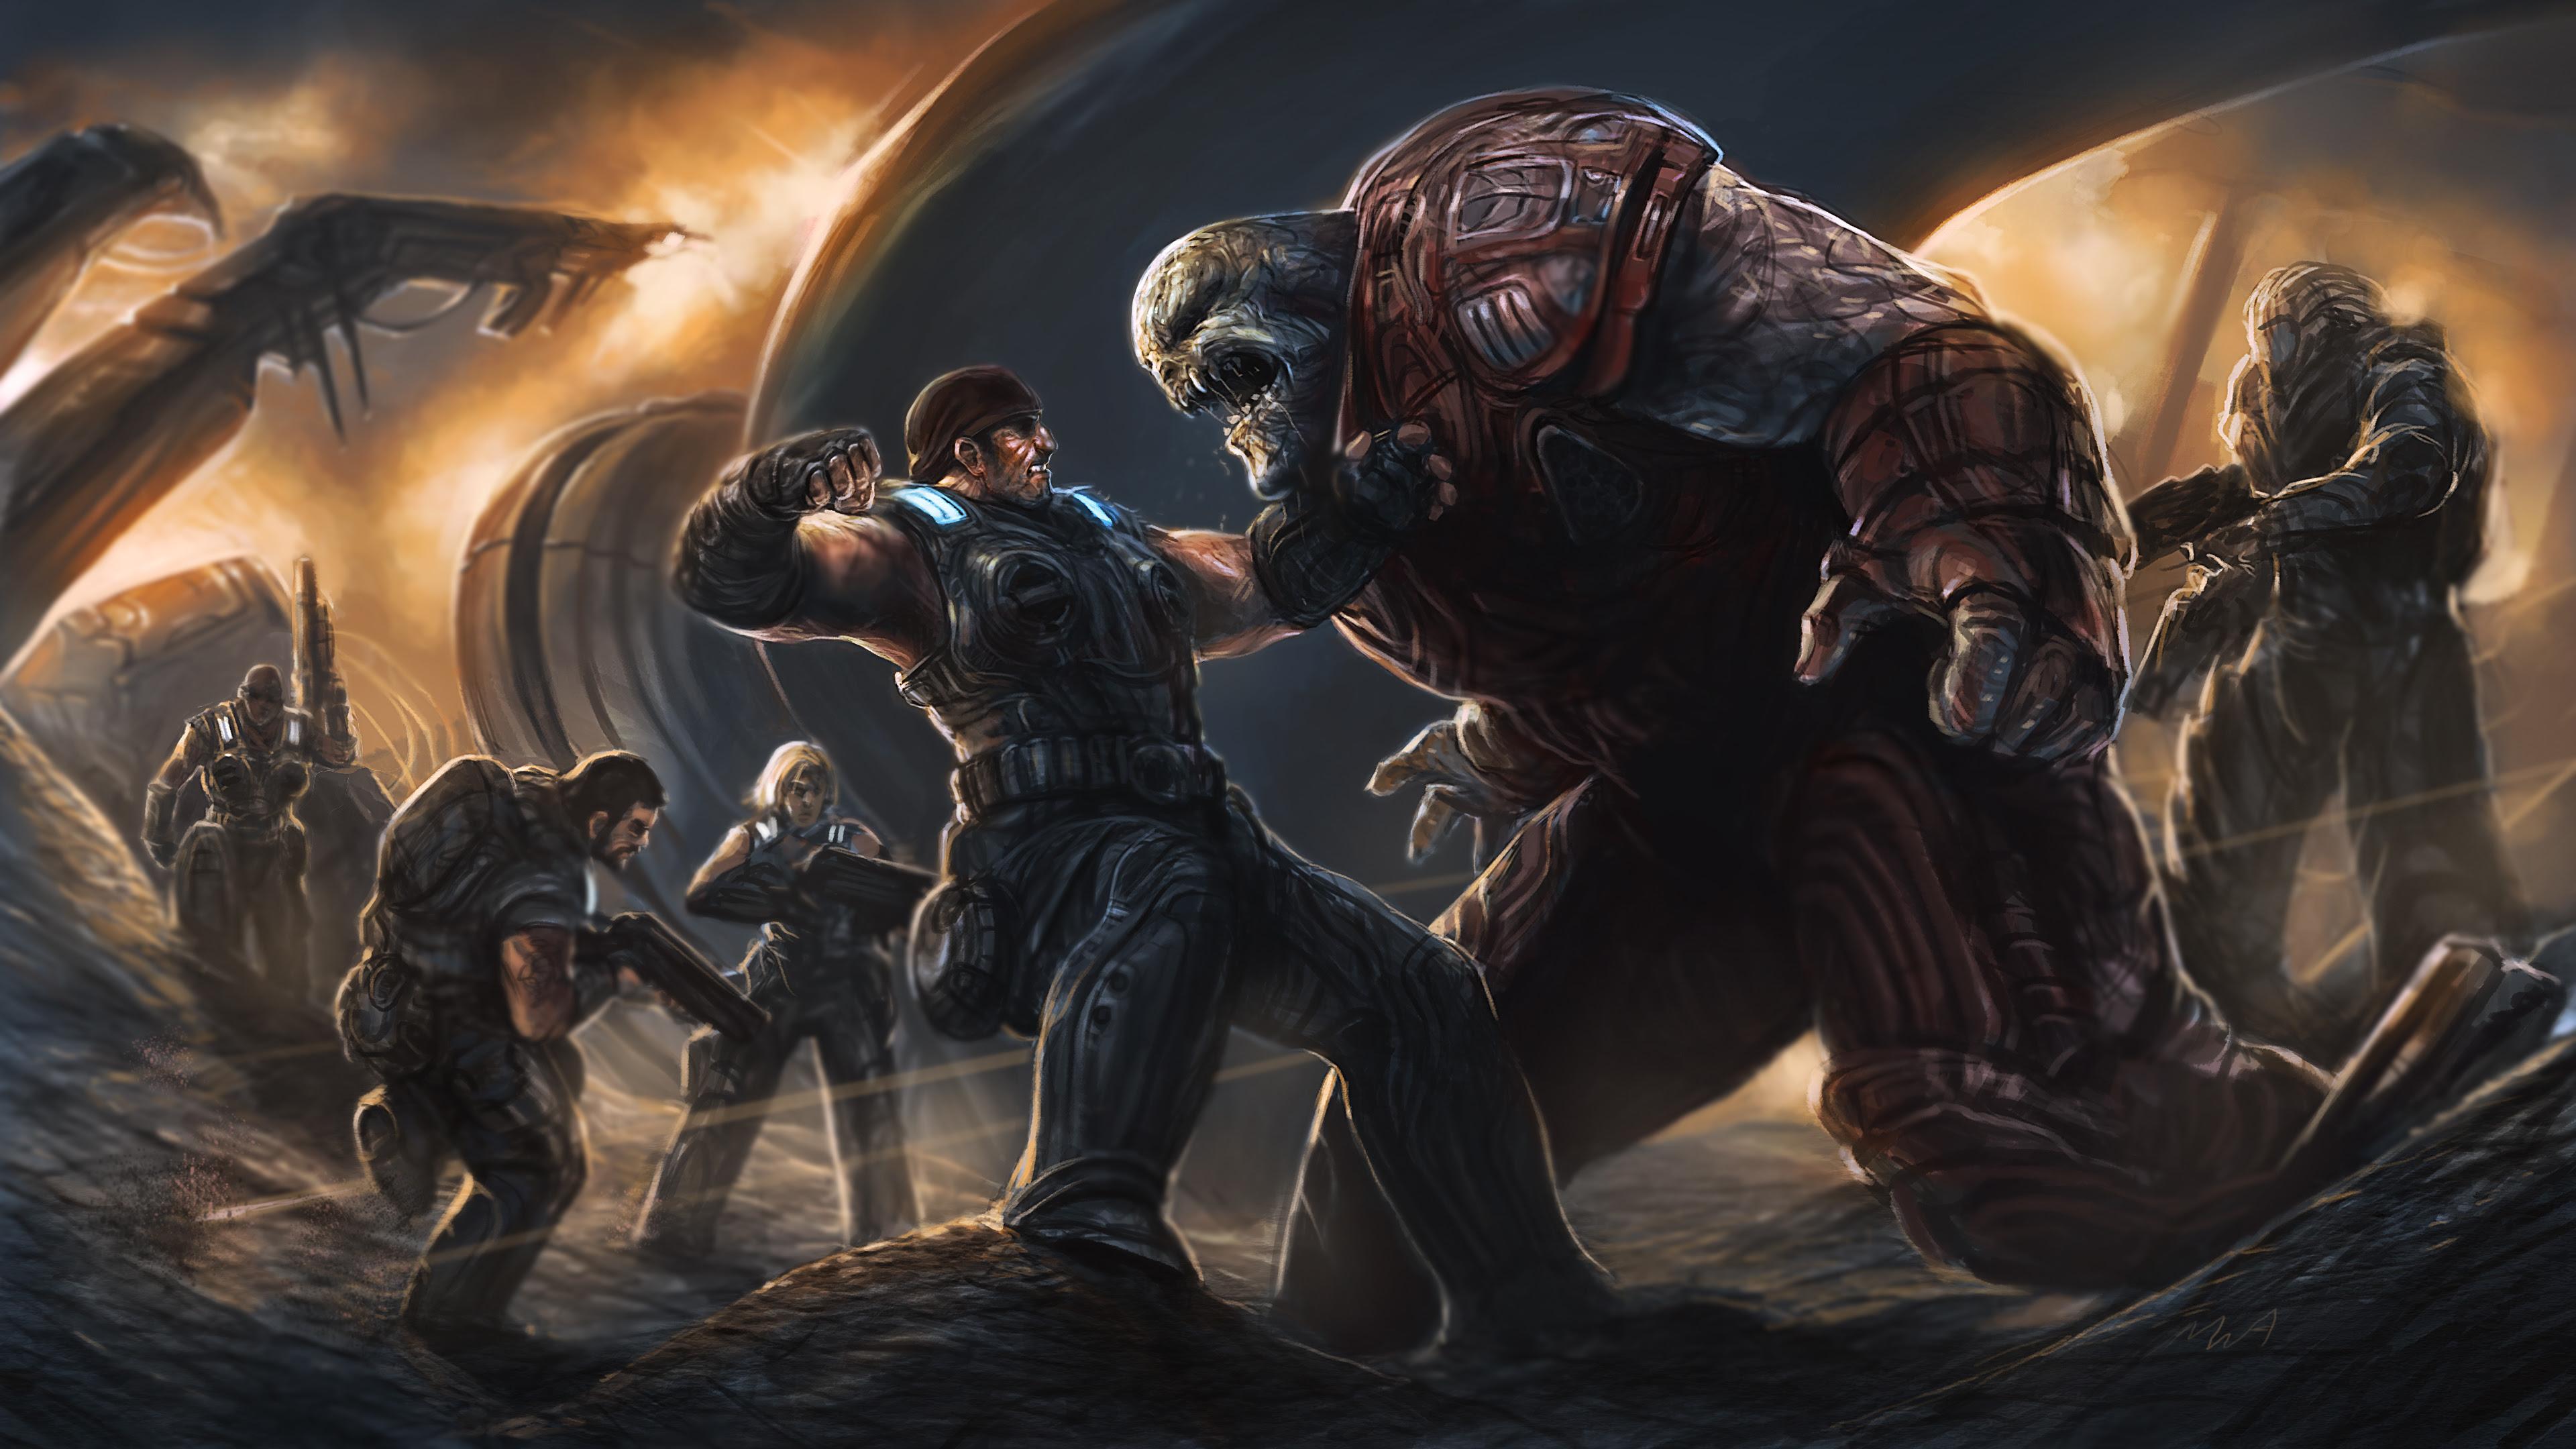 Gears Of War Wallpaper 3840x2160 38586